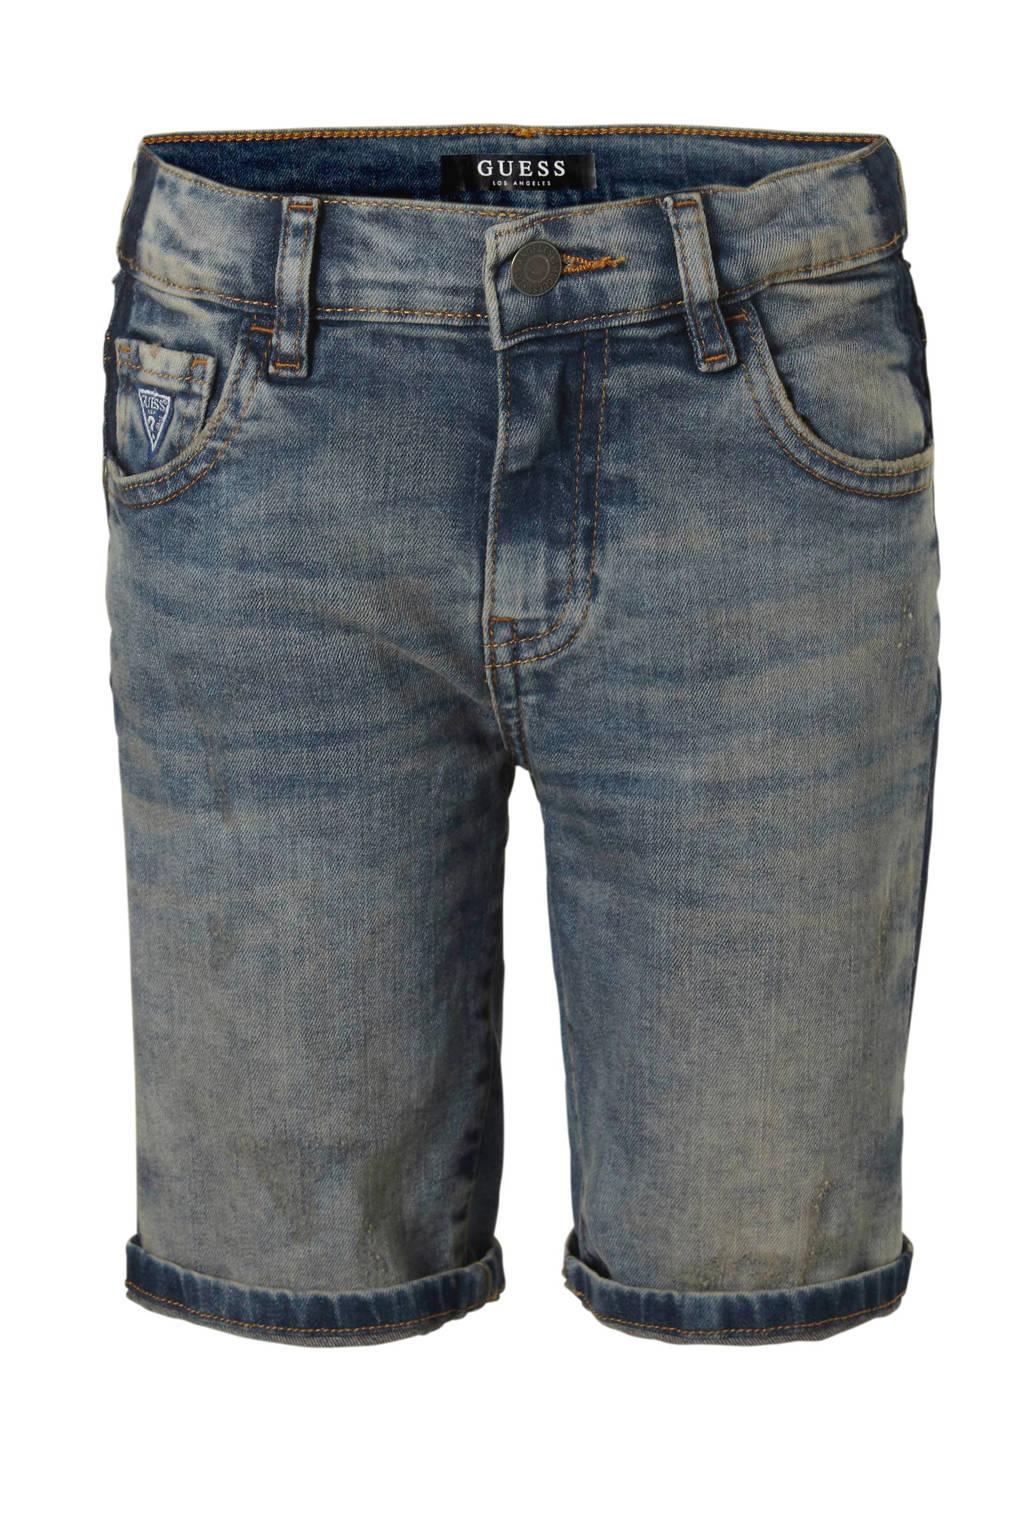 GUESS jeans bermuda met zijstreep, Stonewashed